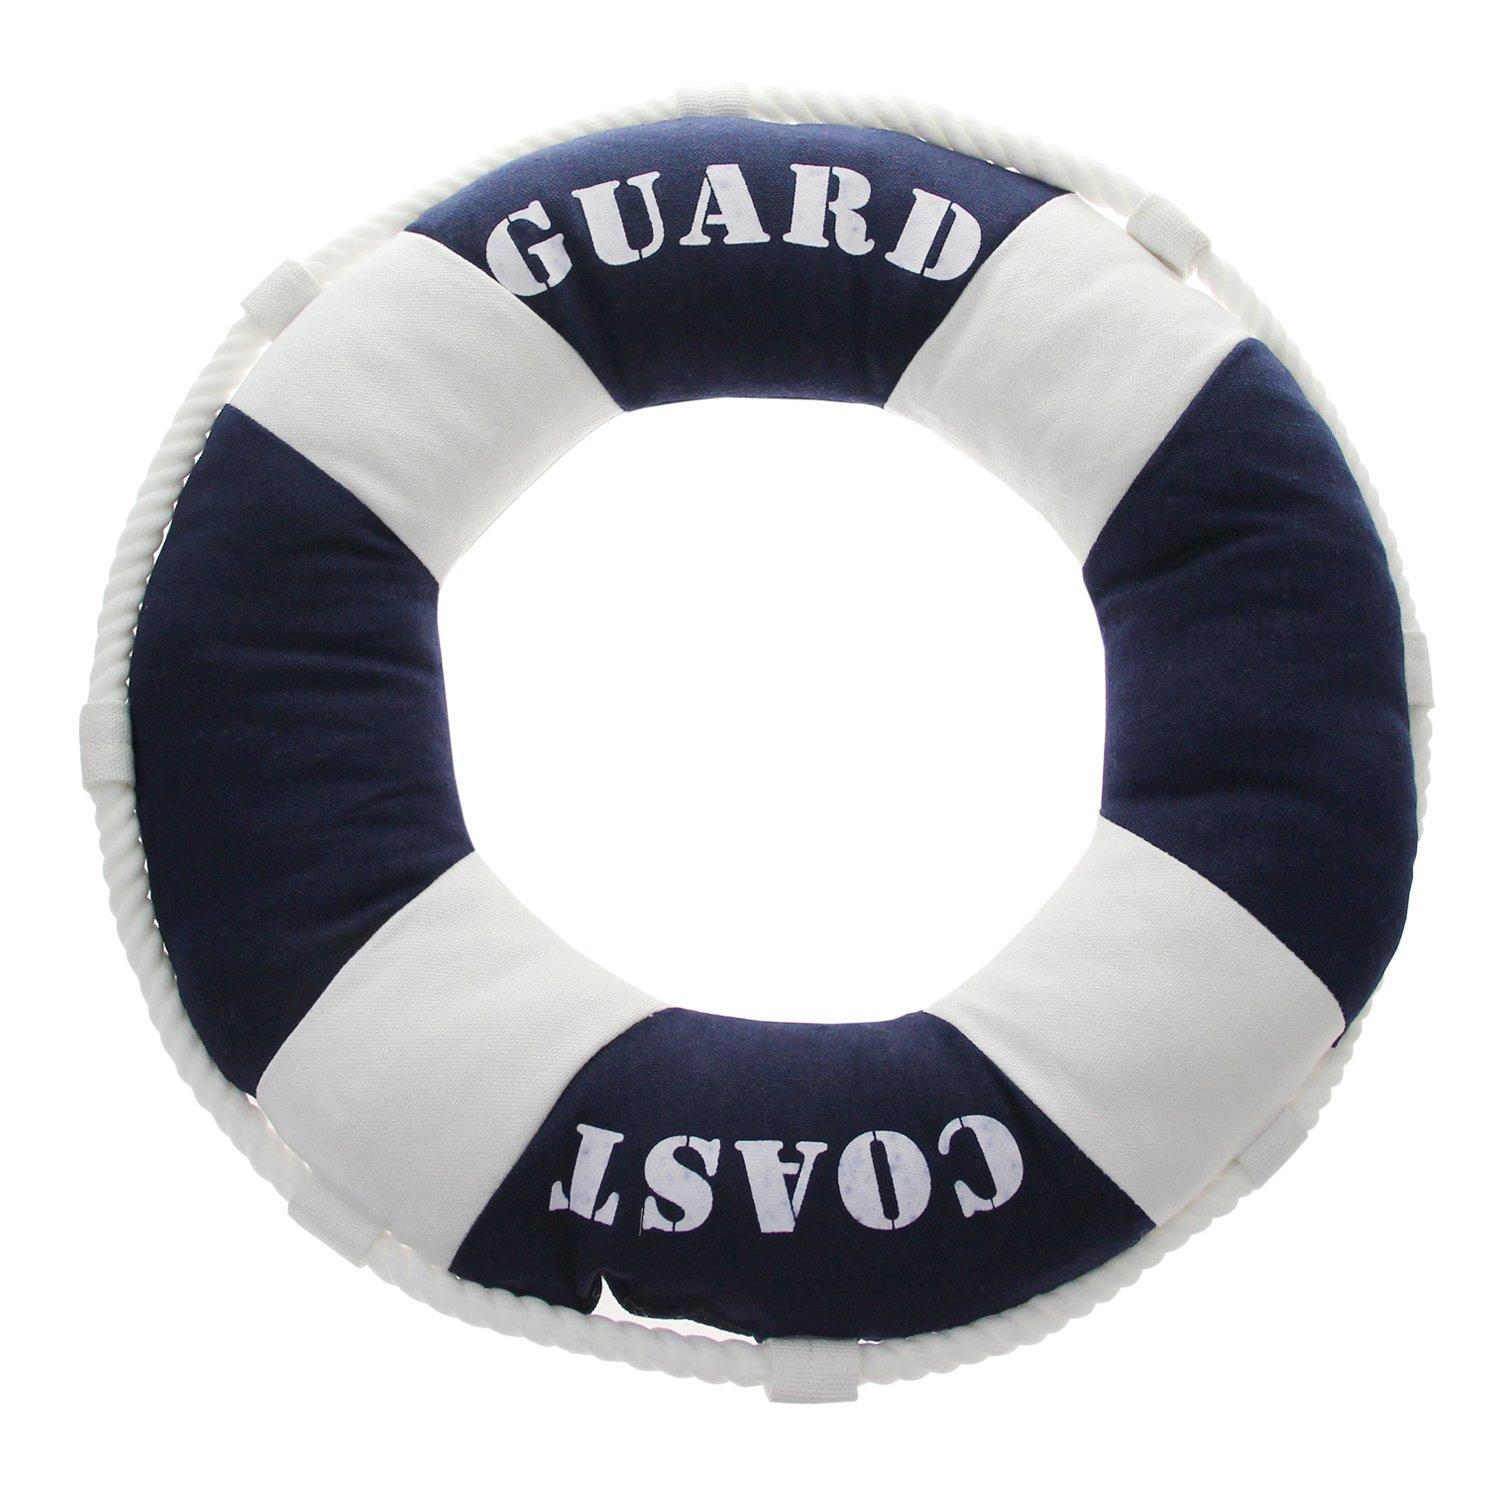 Decorative Nautical Cotton Throw Pillow - Beach Theme 16'' X 16'' Navy Blue White Life Ring Buoy Design, Sofa Couch Bedroom Cushion